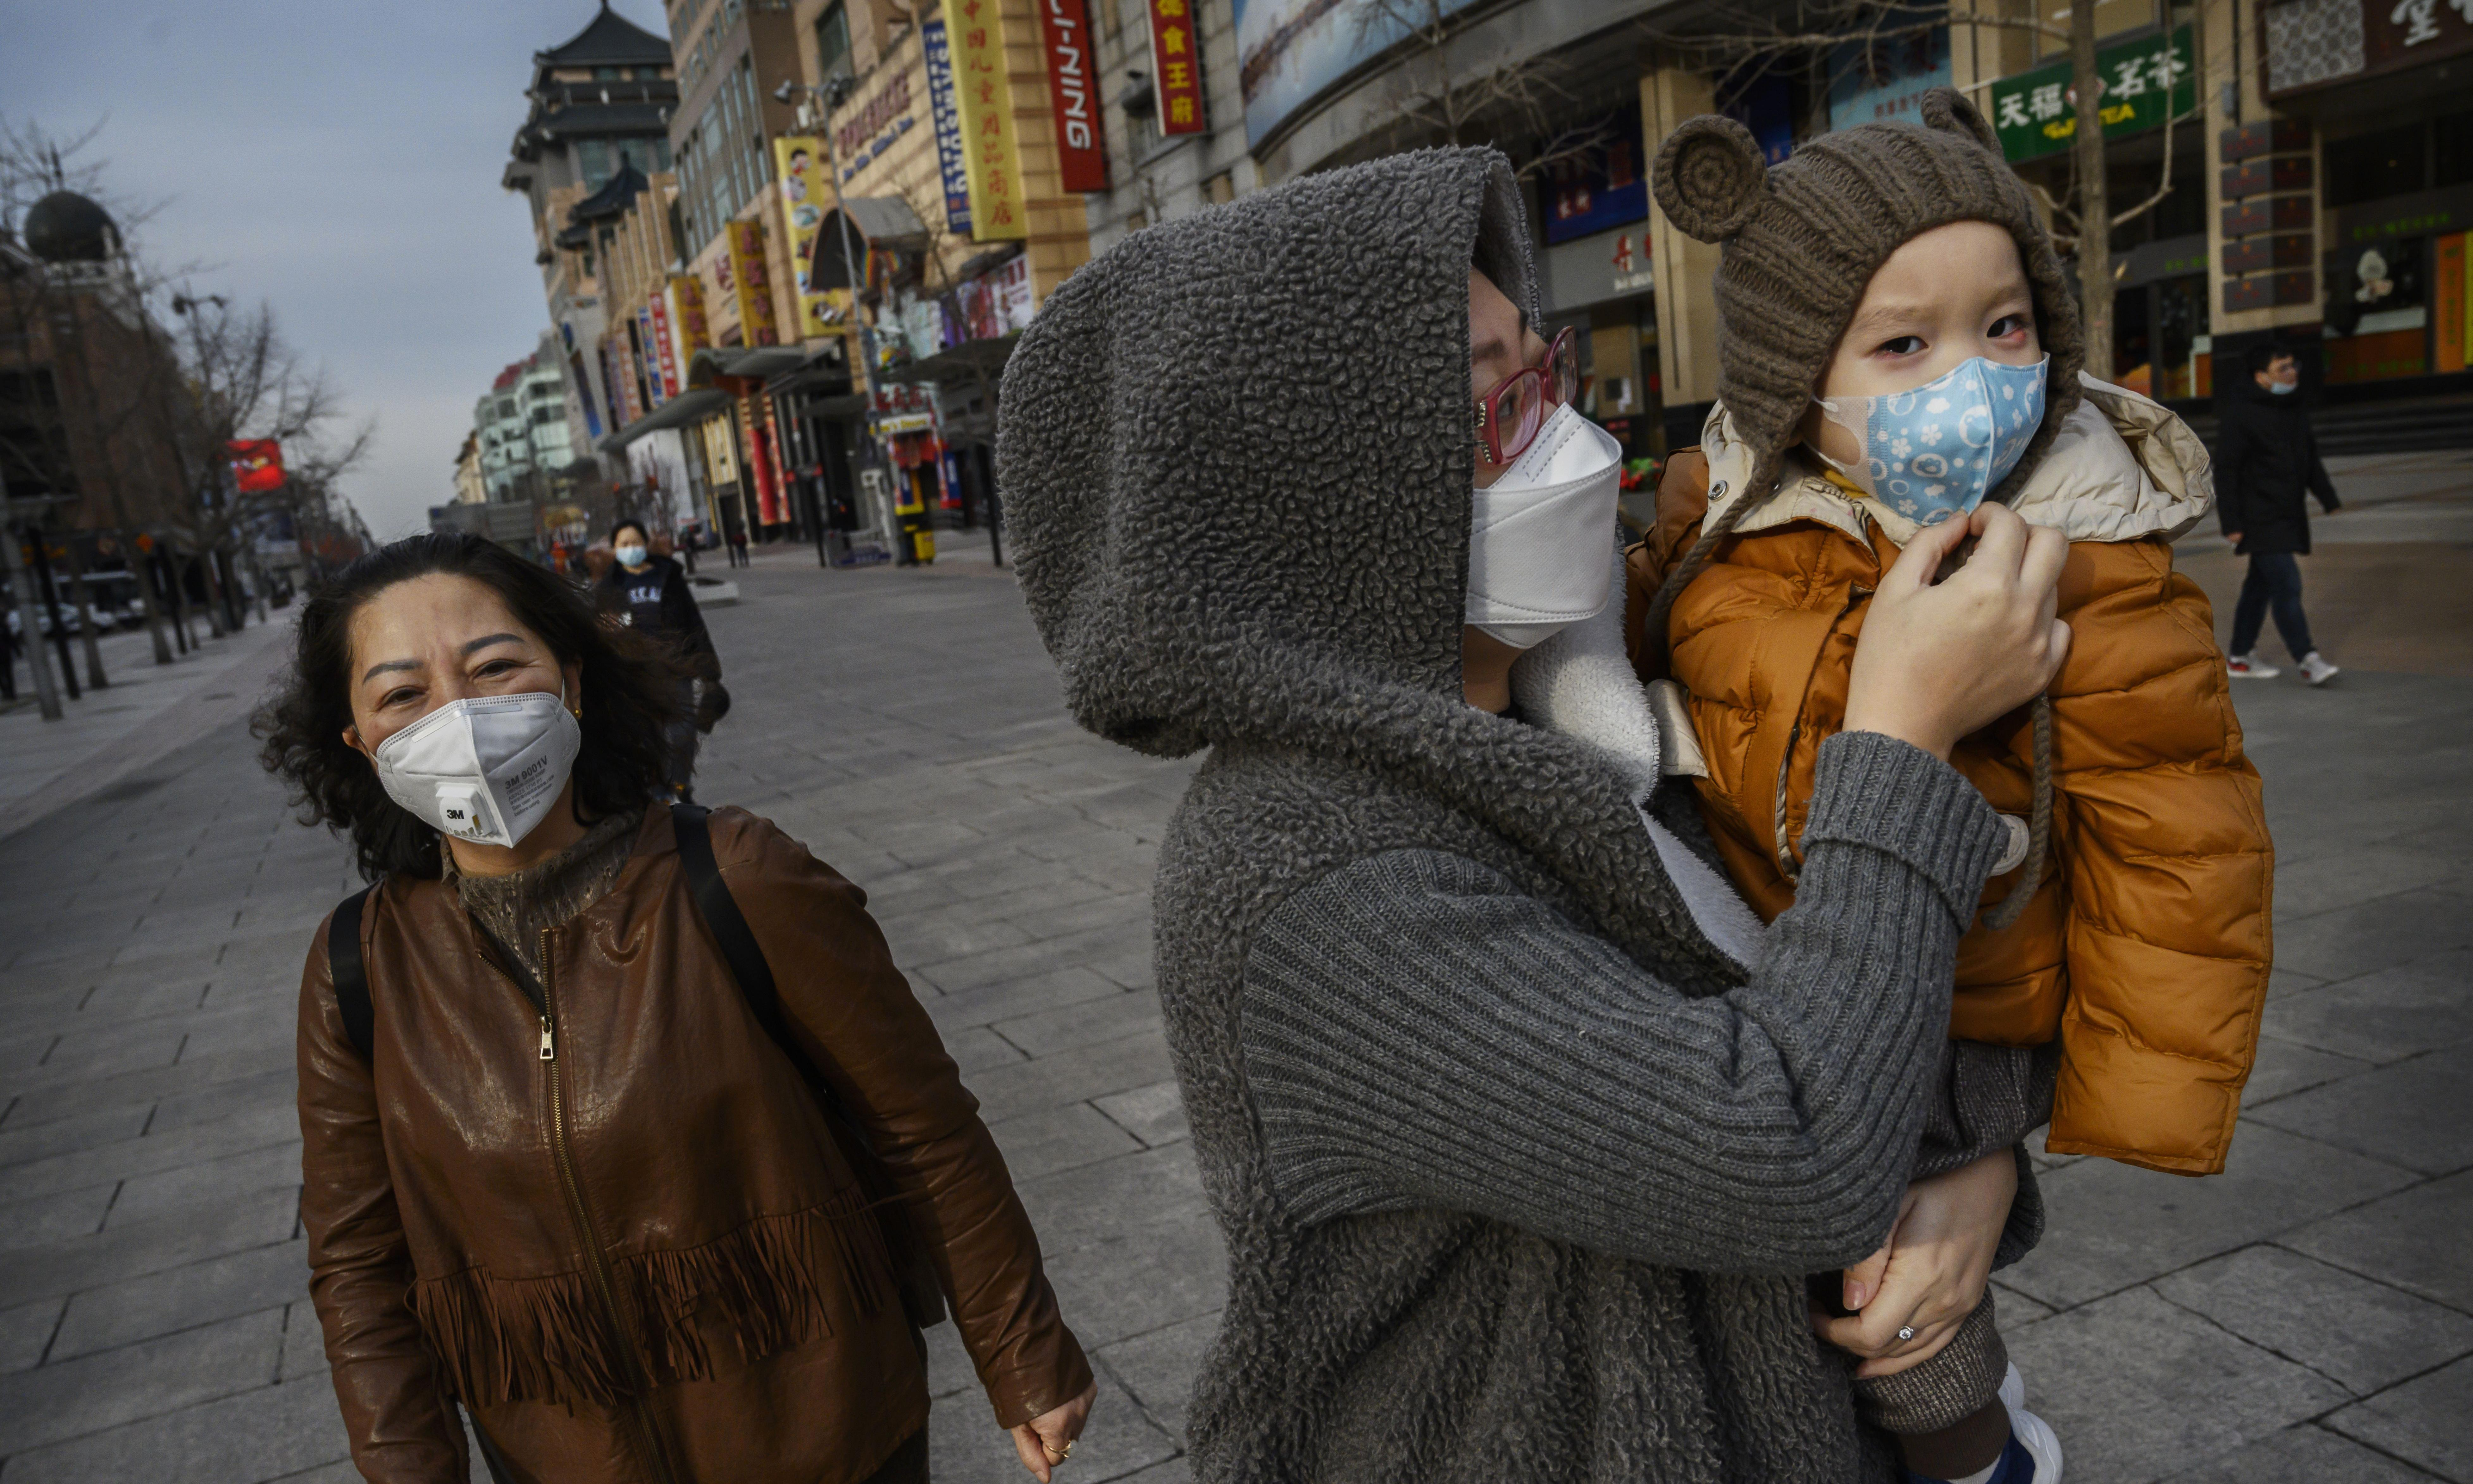 Dissent becomes the next victim of coronavirus as China cracks down